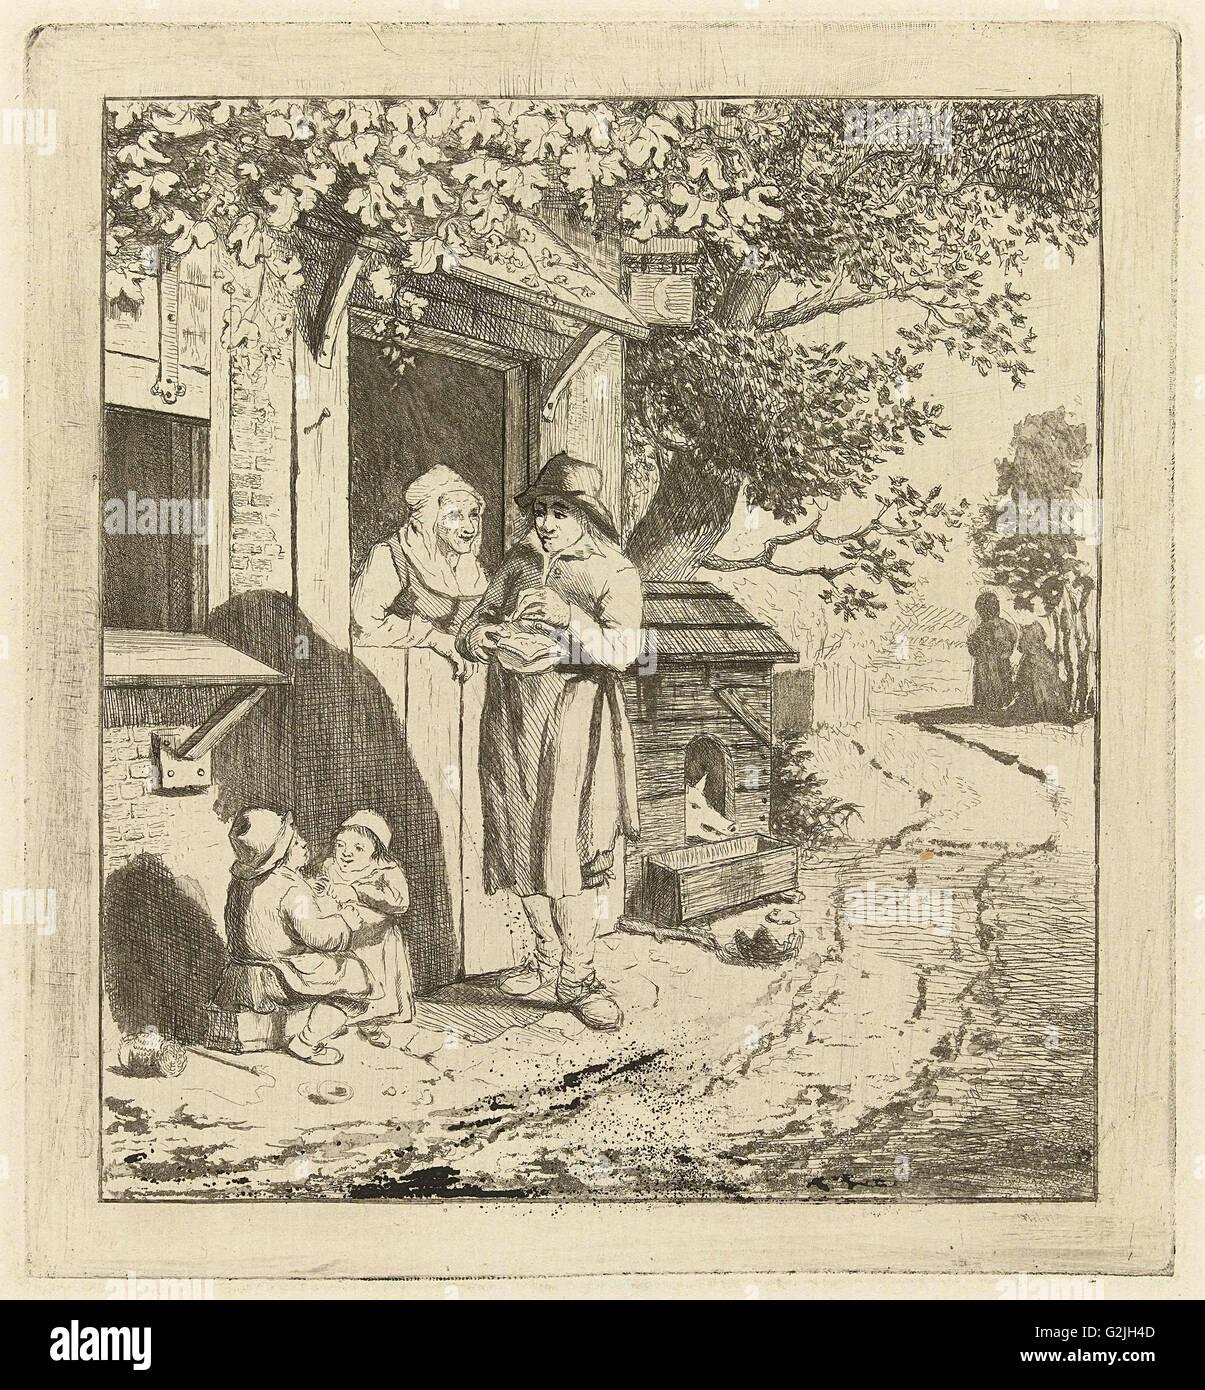 Man at the door of an inn, Marie Lambertine Coclers, 1776 - 1815 - Stock Image